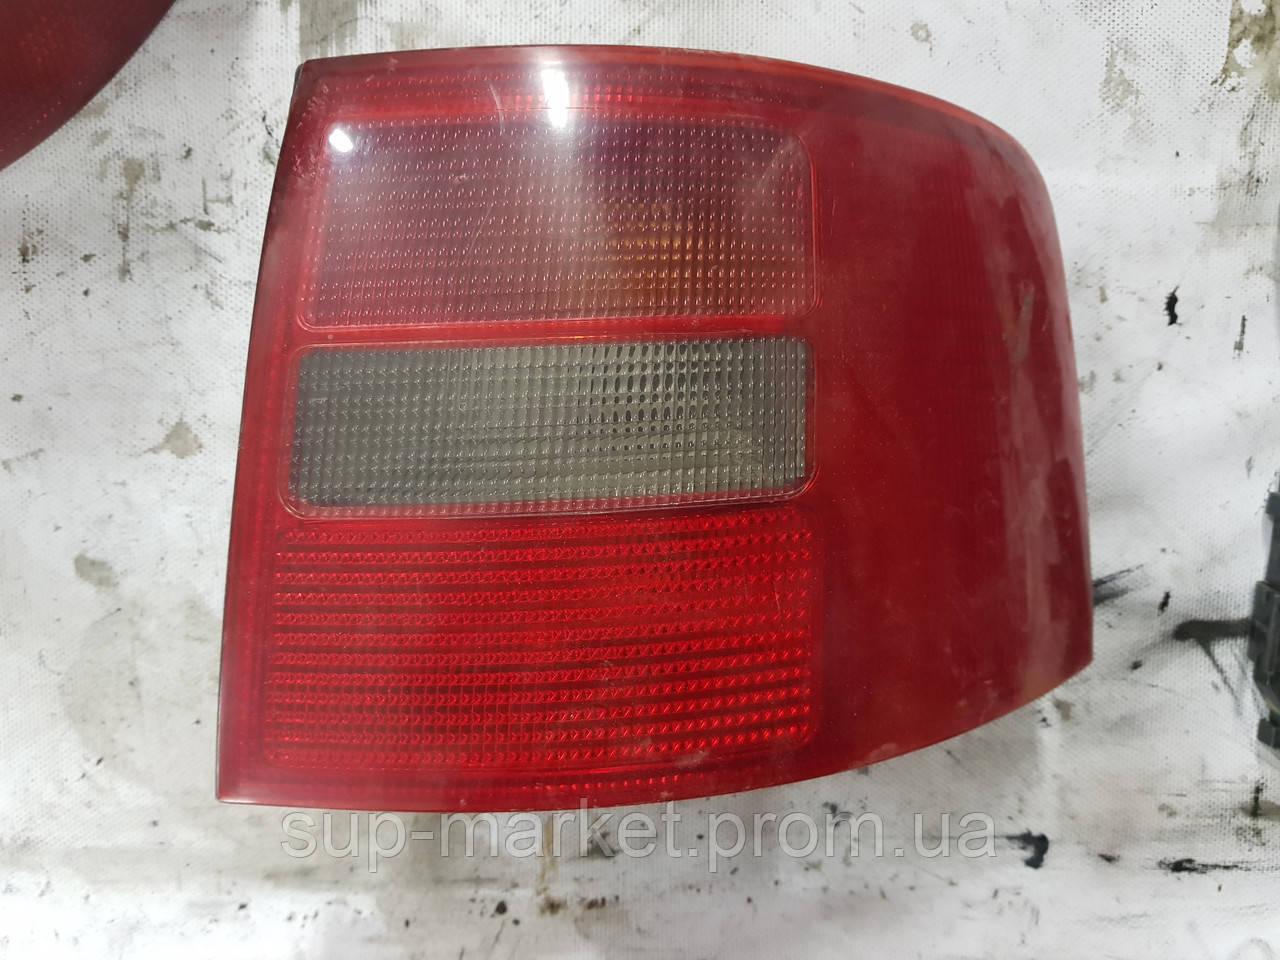 4B9945096D3FZ Фонарь задний правый Audi A6 C5 1997-2005 R